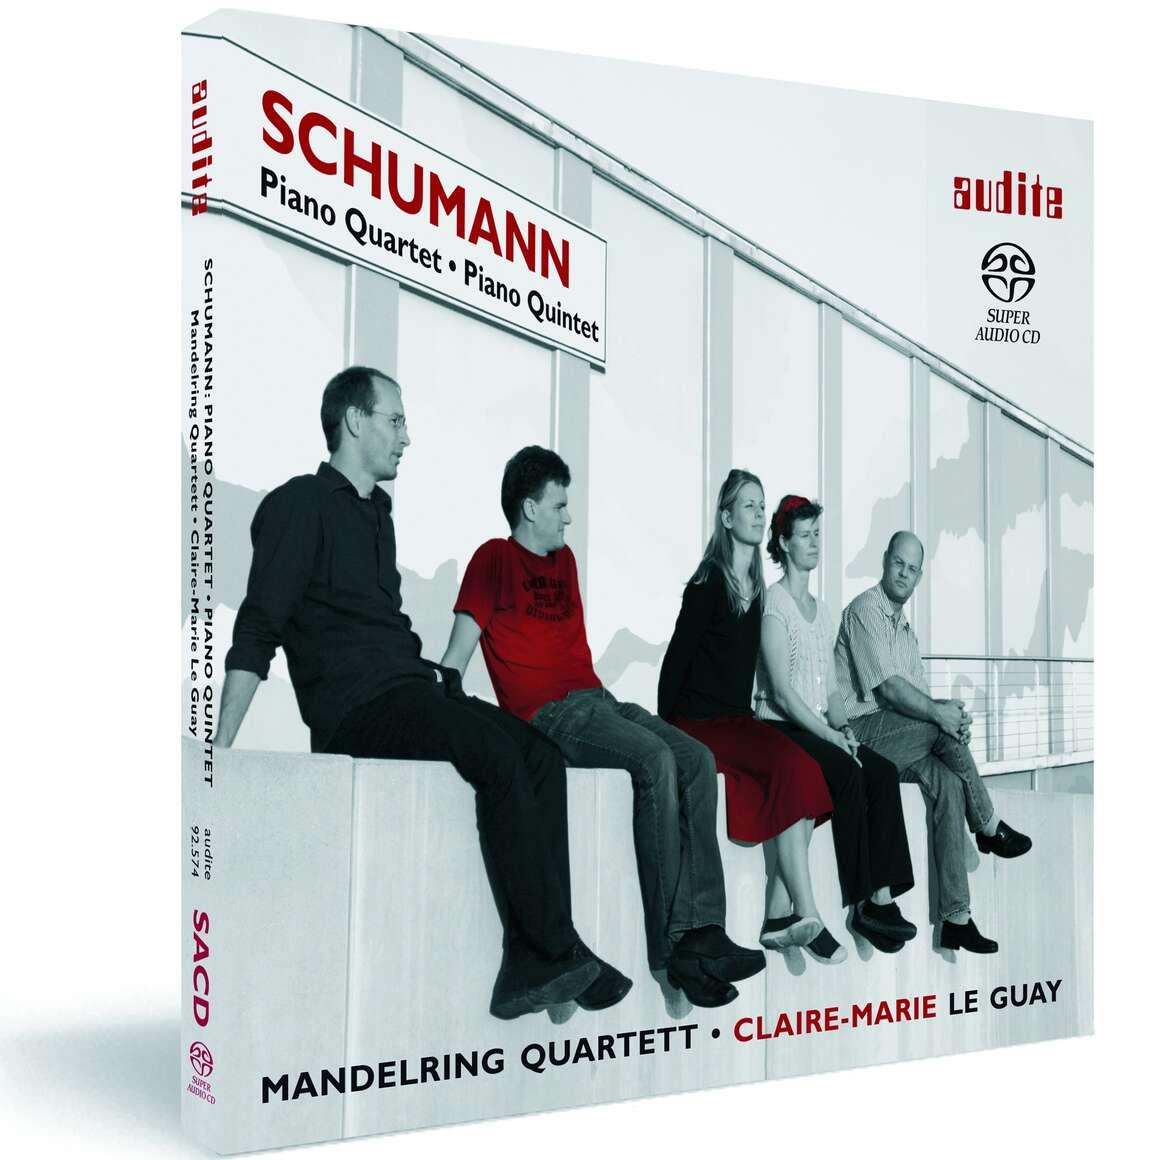 R. Schumann: Piano Quartet & Piano Quintet